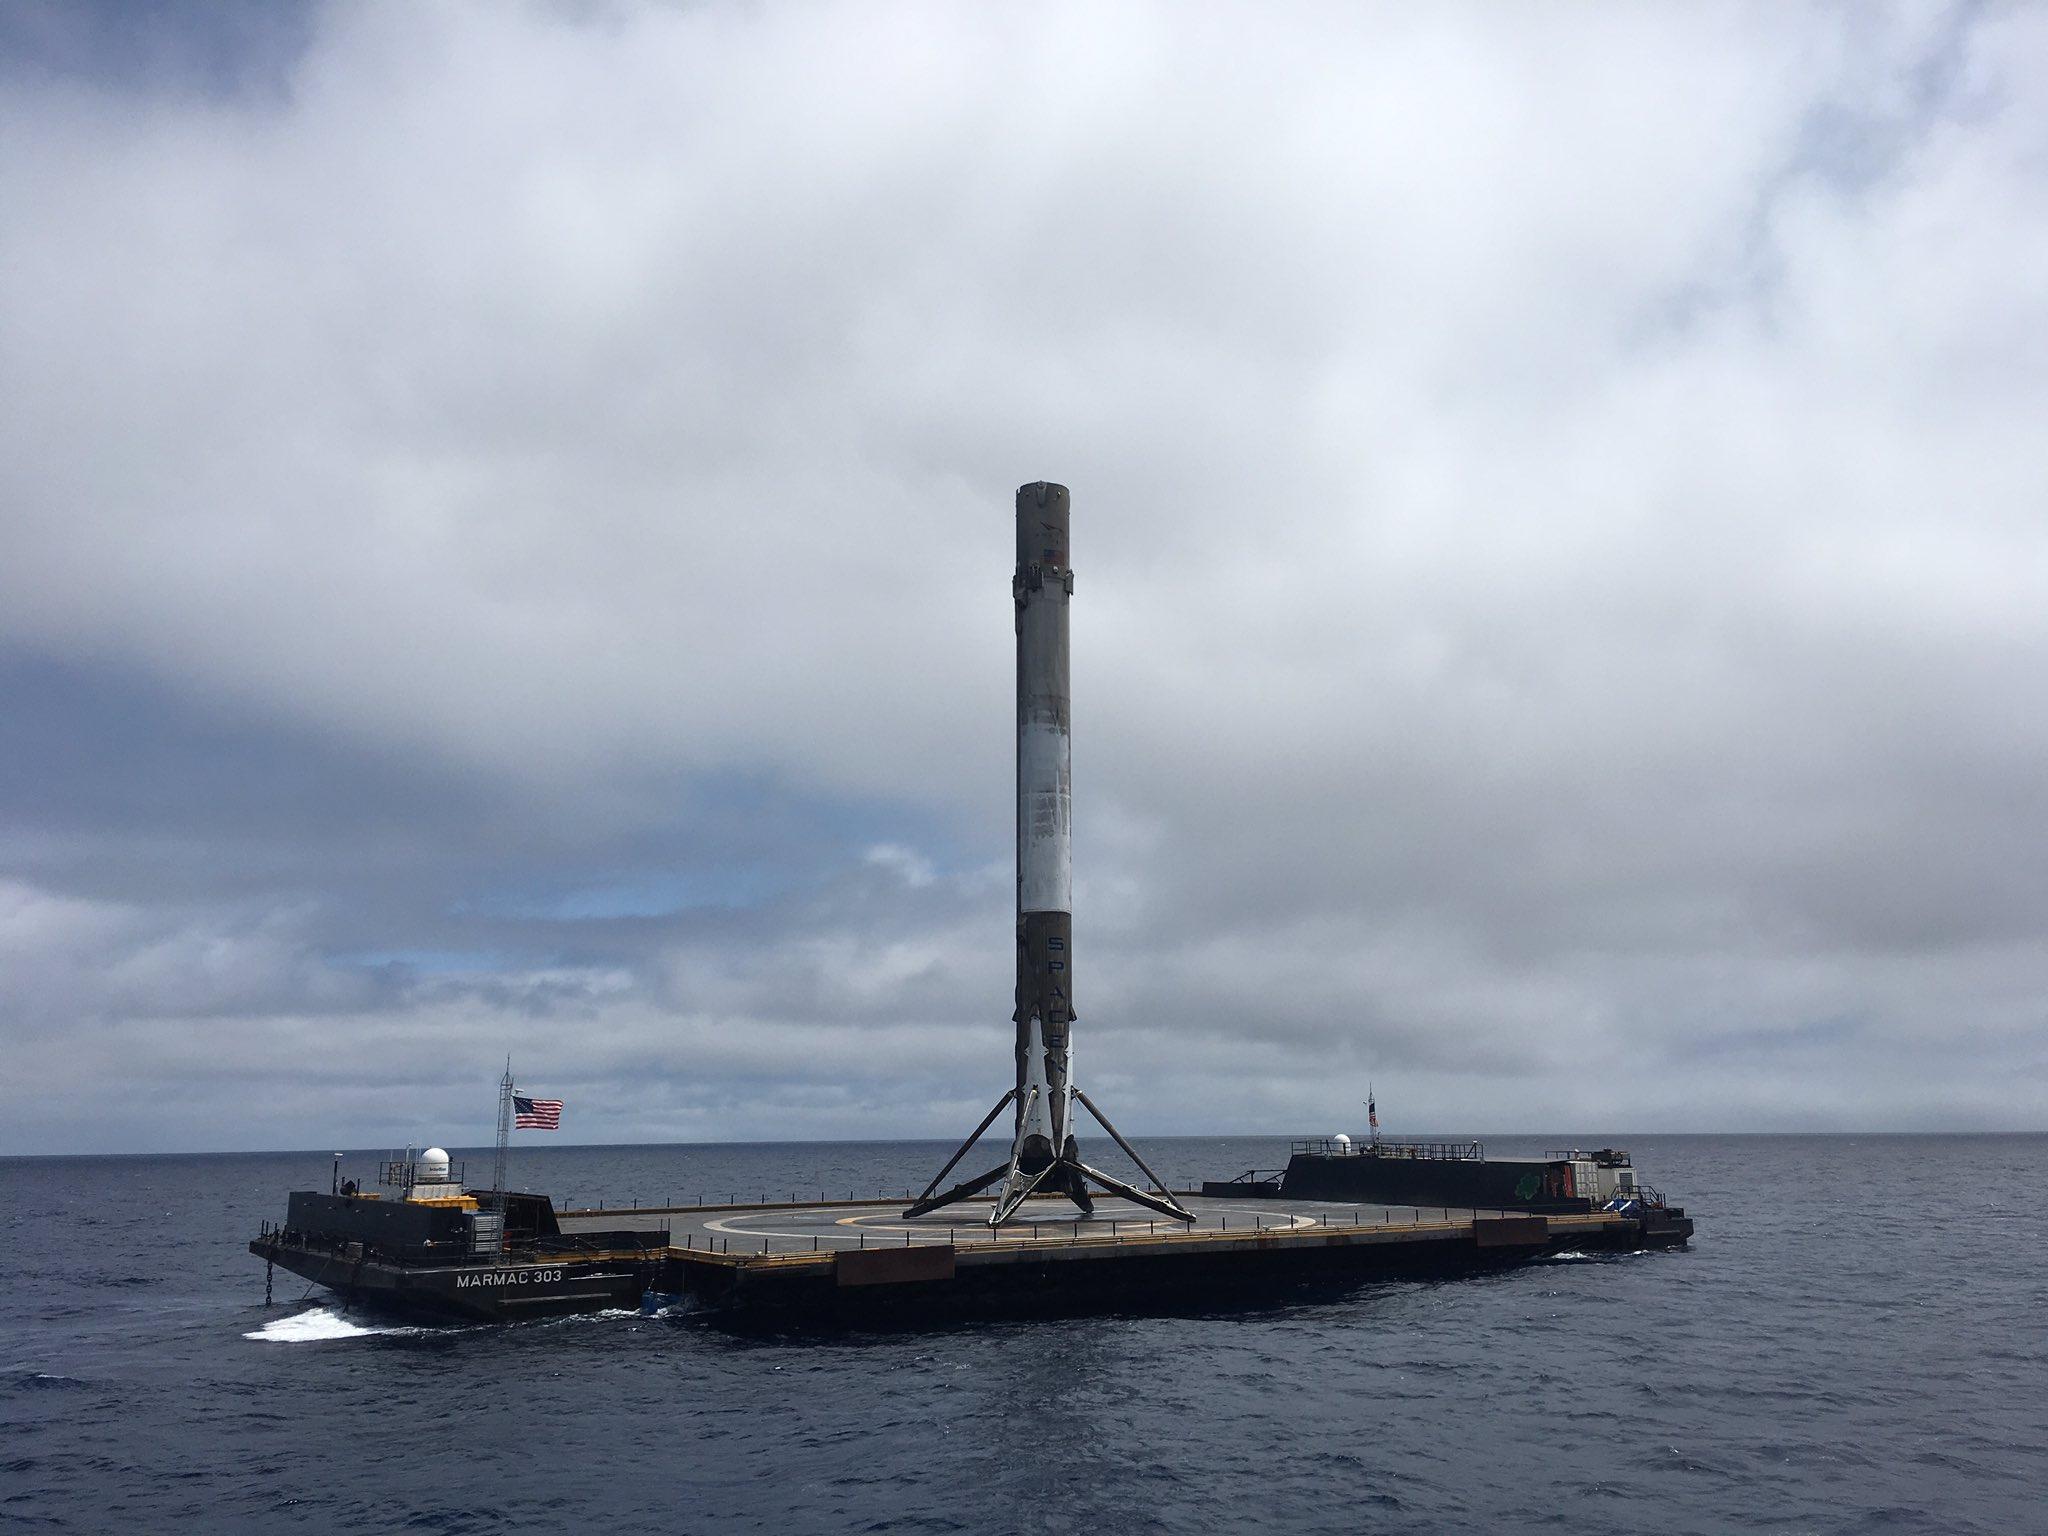 1038 landing – formosat 5